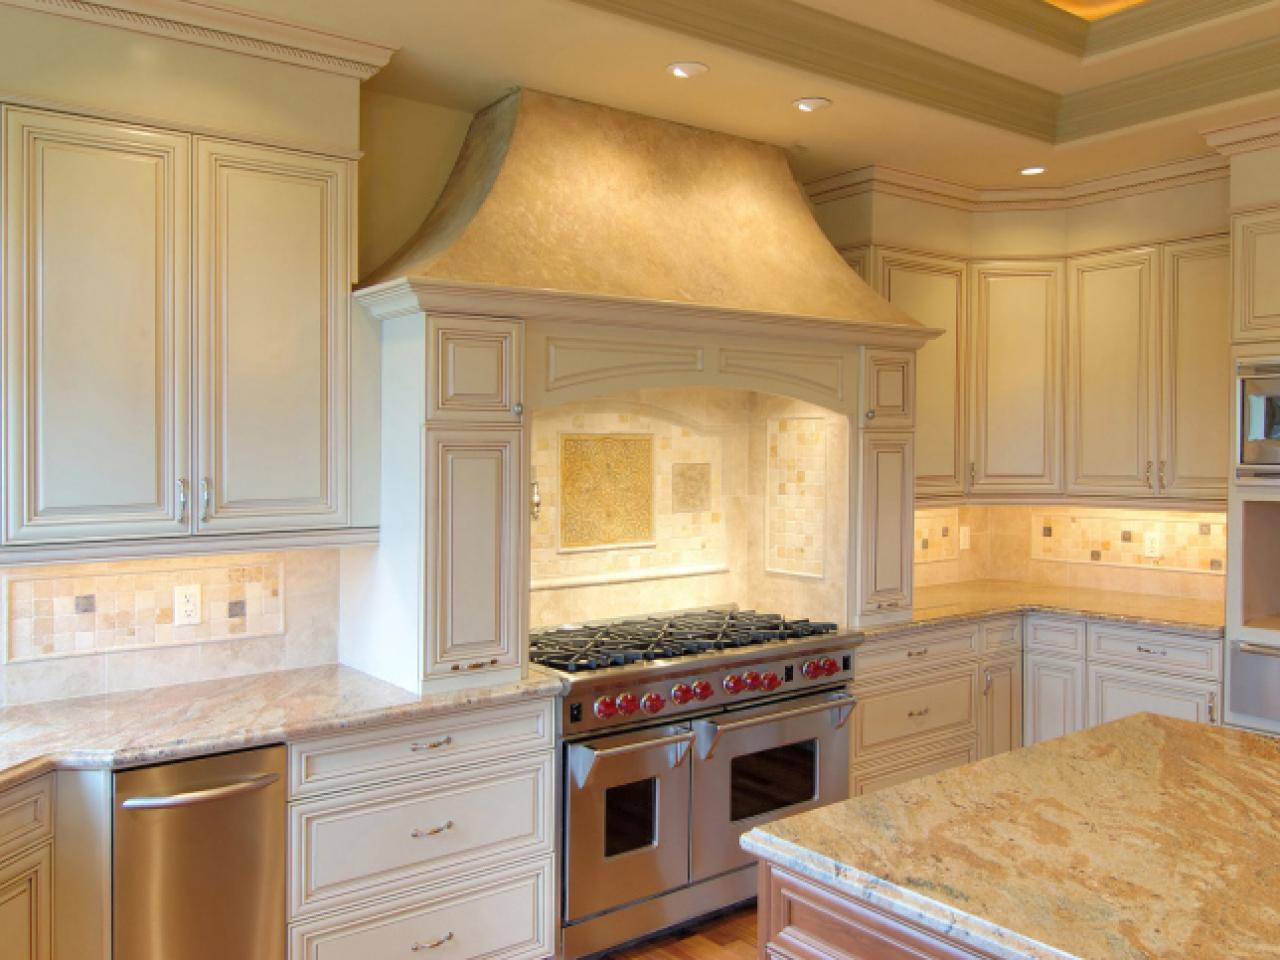 Backplates for Knobs on Kitchen Cabinets Set — Schmidt ...